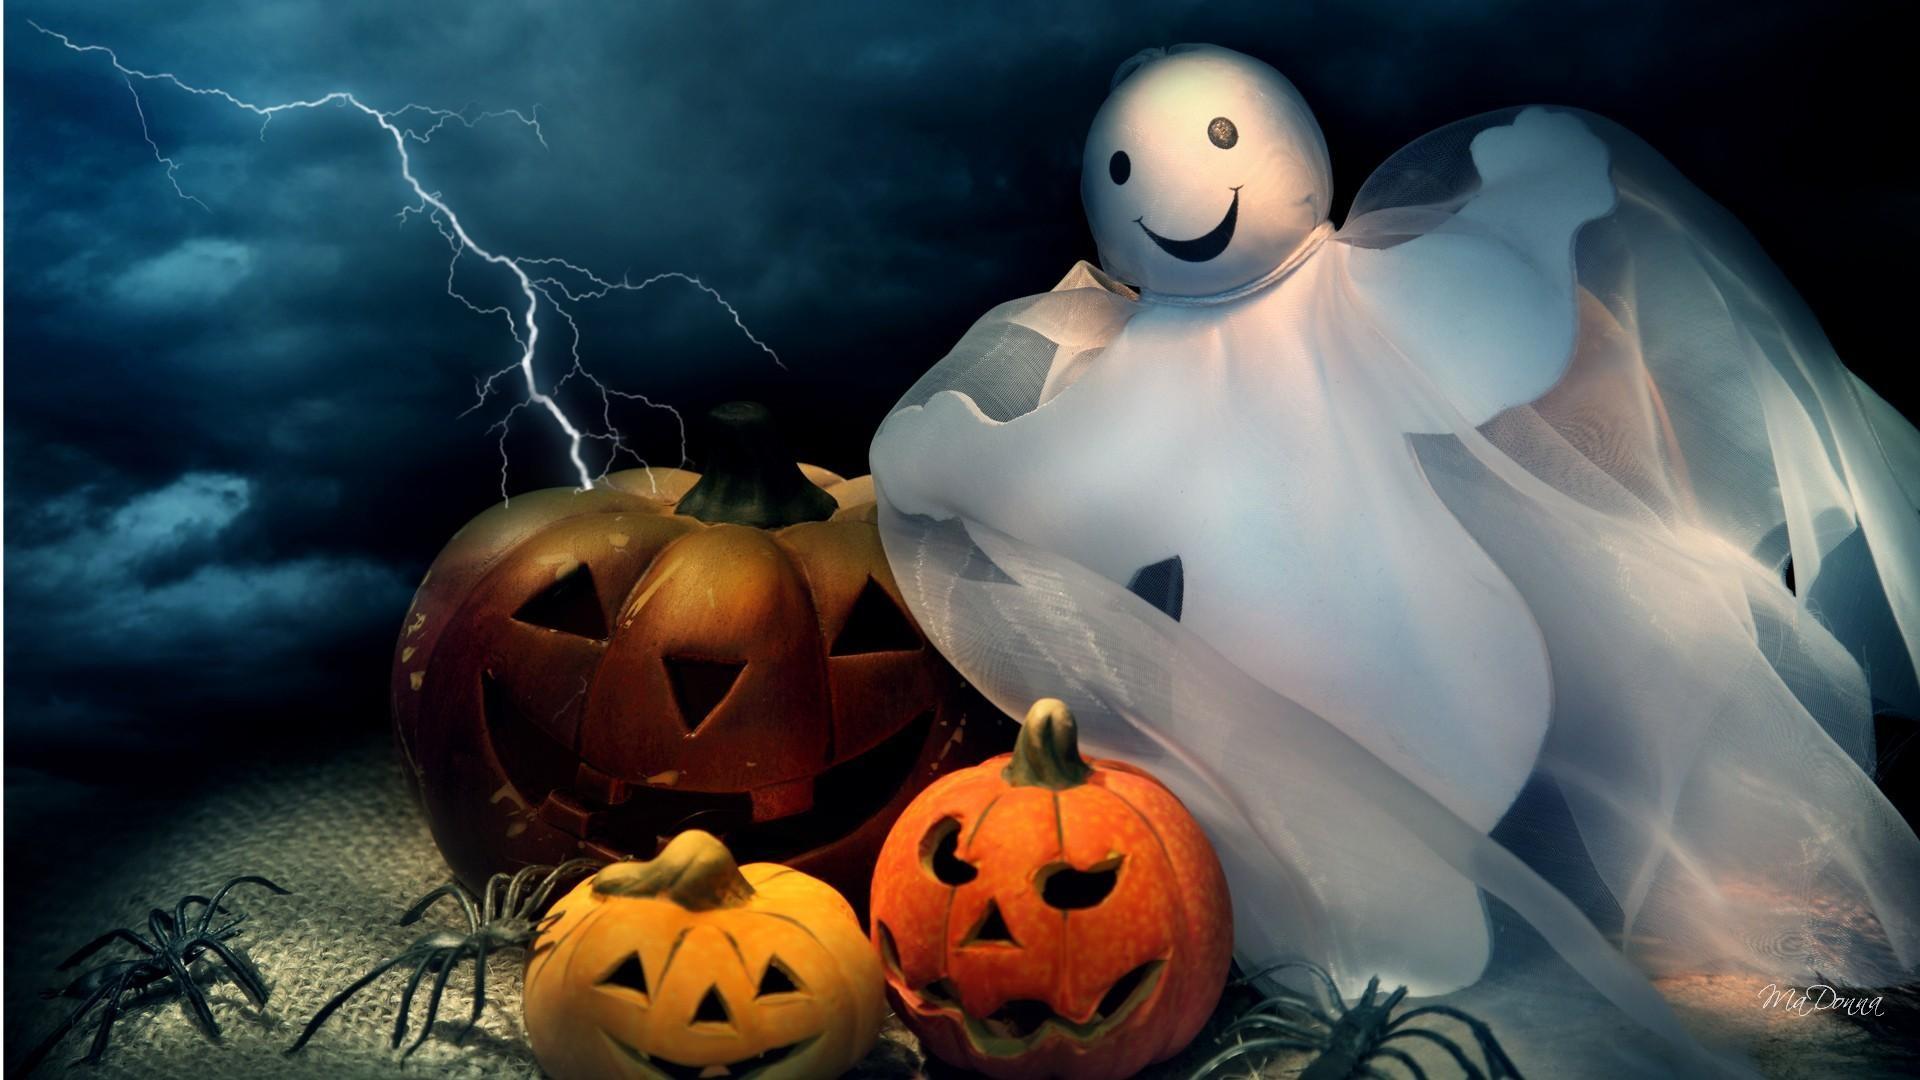 … Happy Halloween My Friends wallpaper other Wallpaper Better